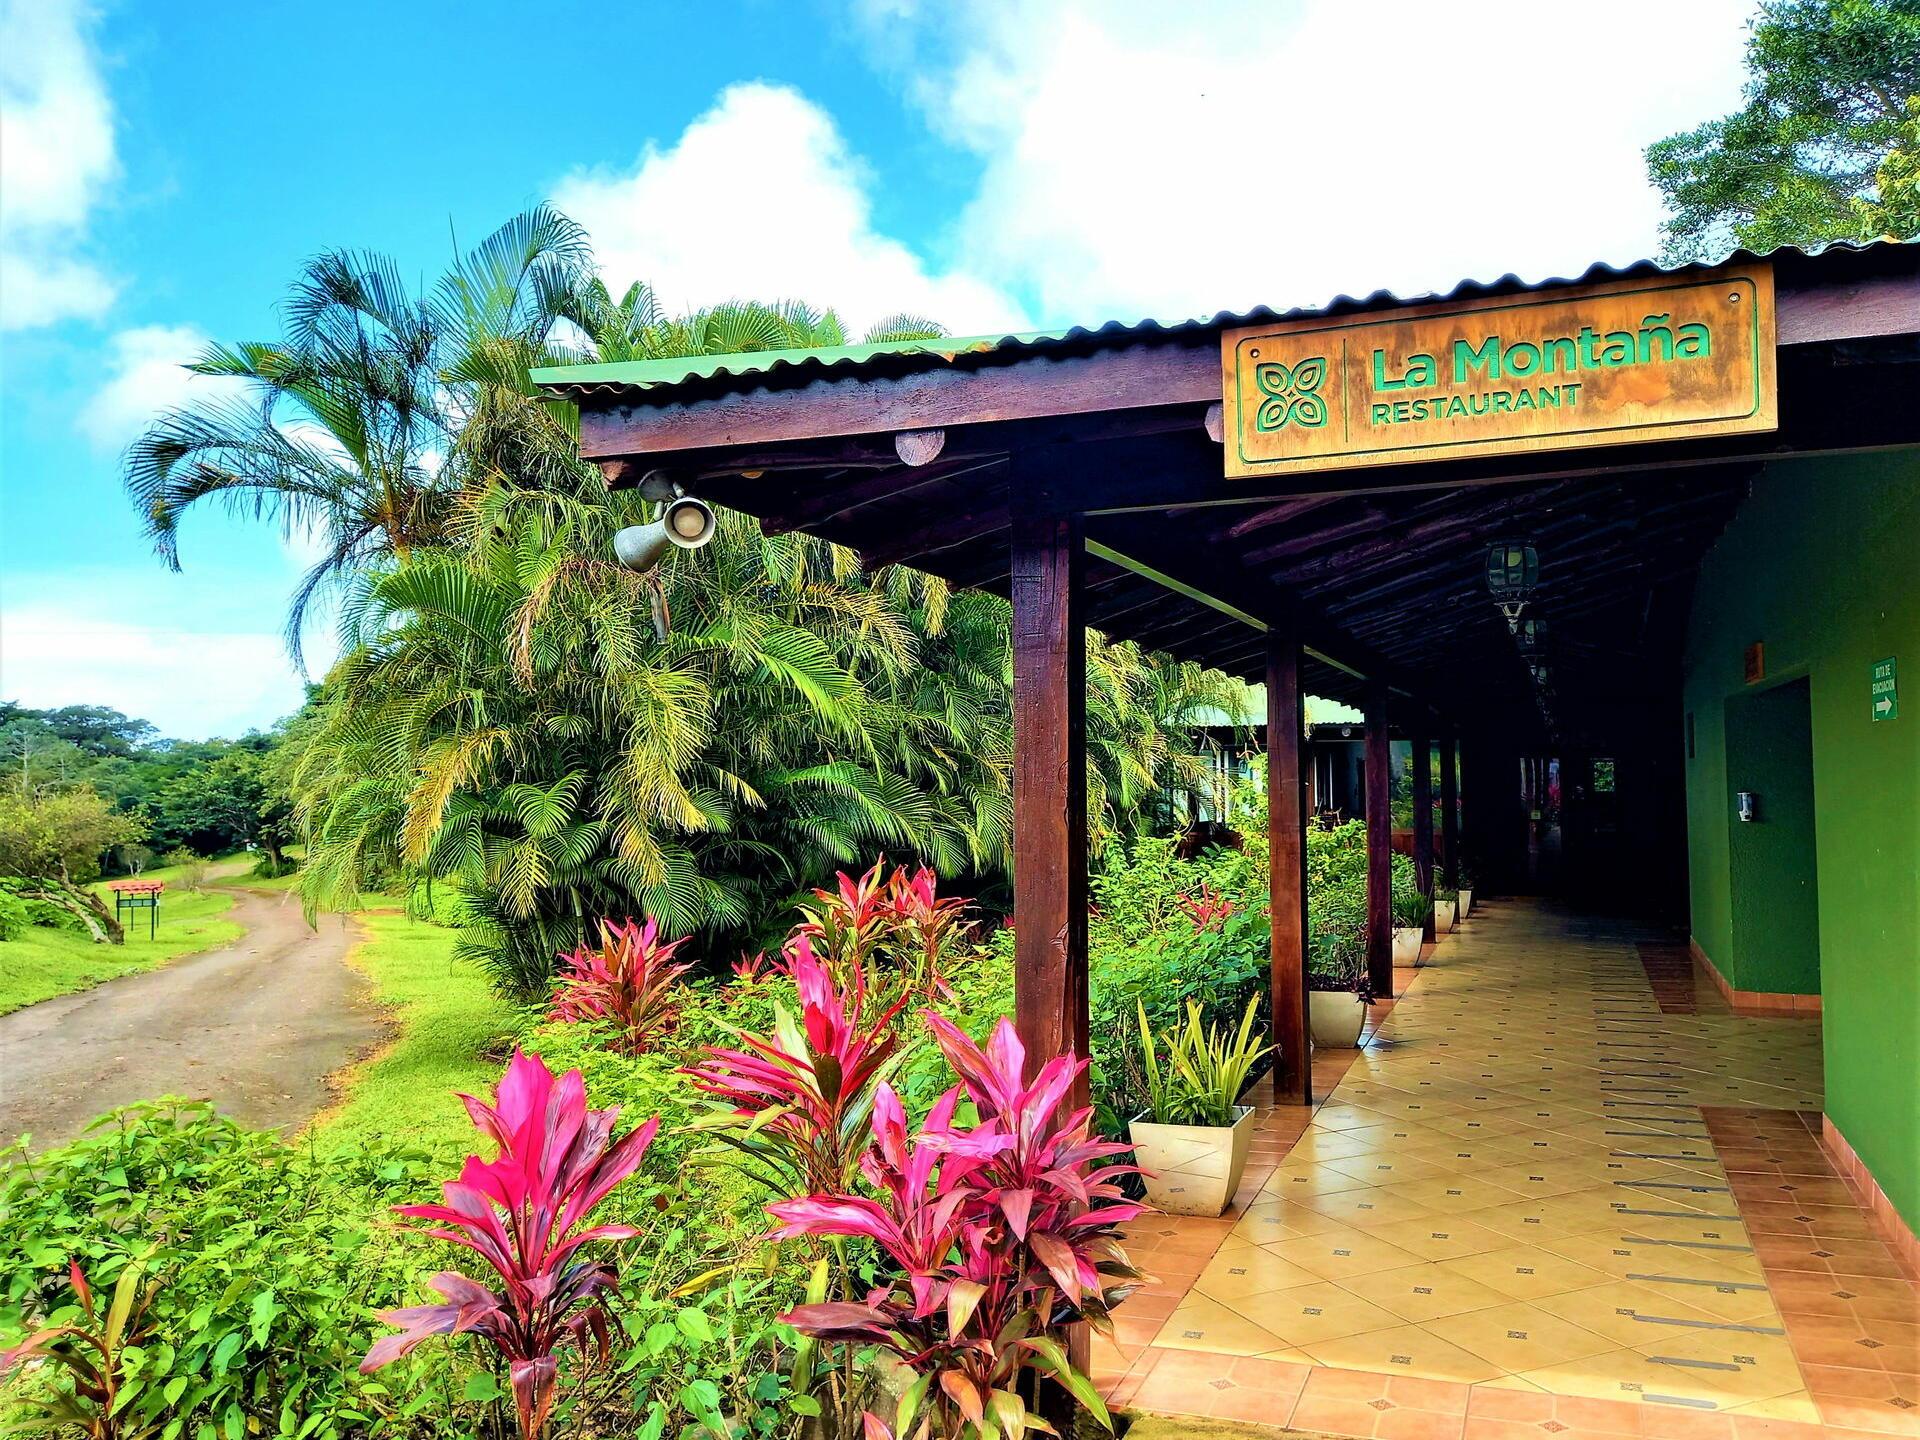 Pathway to a Restaurant with Plants at Buena Vista Del Rincon